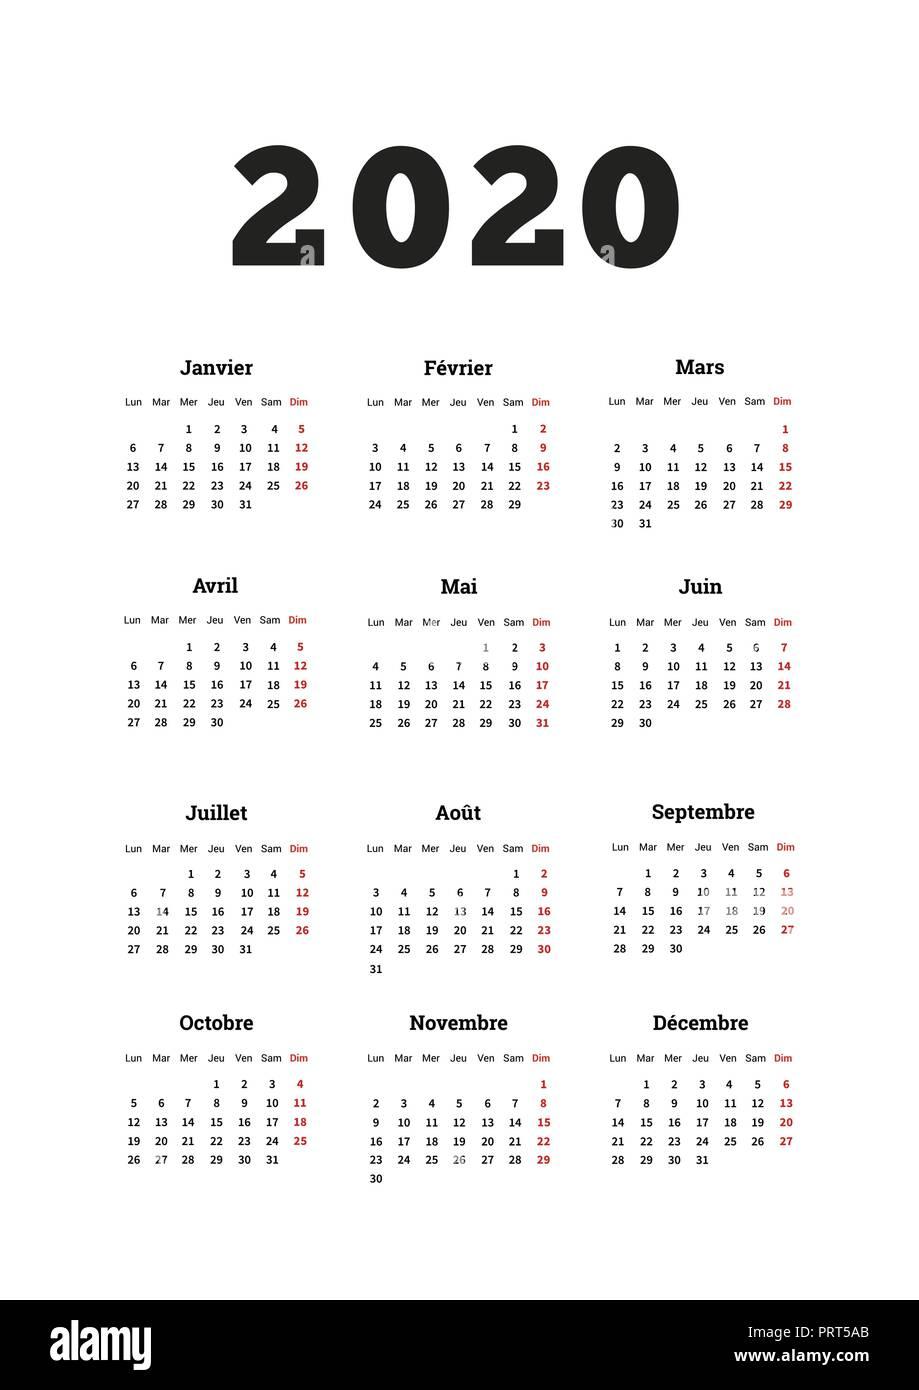 Calendario 2020 Editable Illustrator.2020 Year Simple Calendar On French Language A4 Size